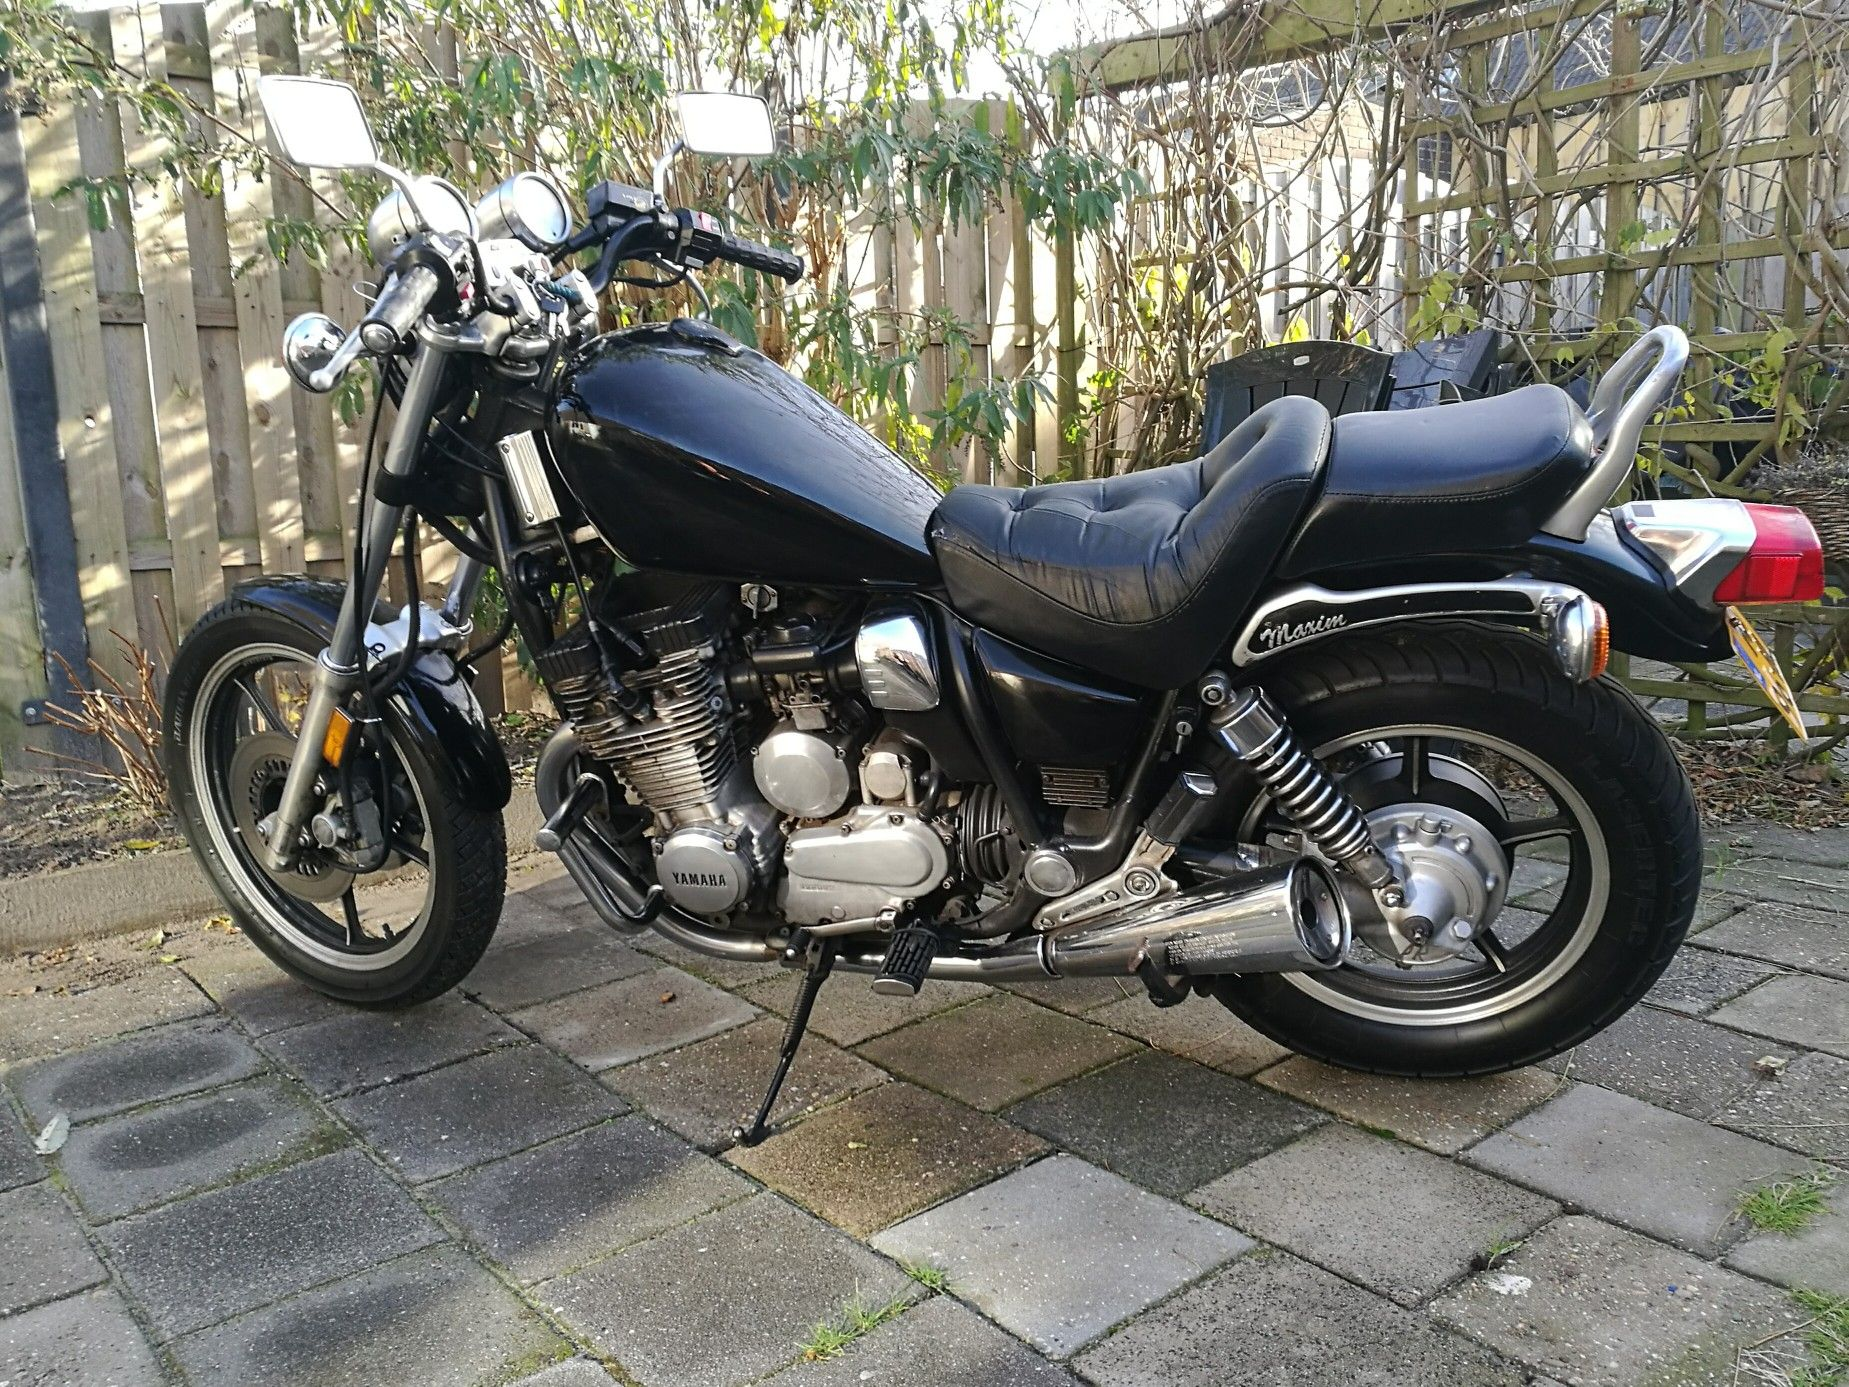 1985 Yamaha XJ 700 S Maxim Photos, Informations, Articles